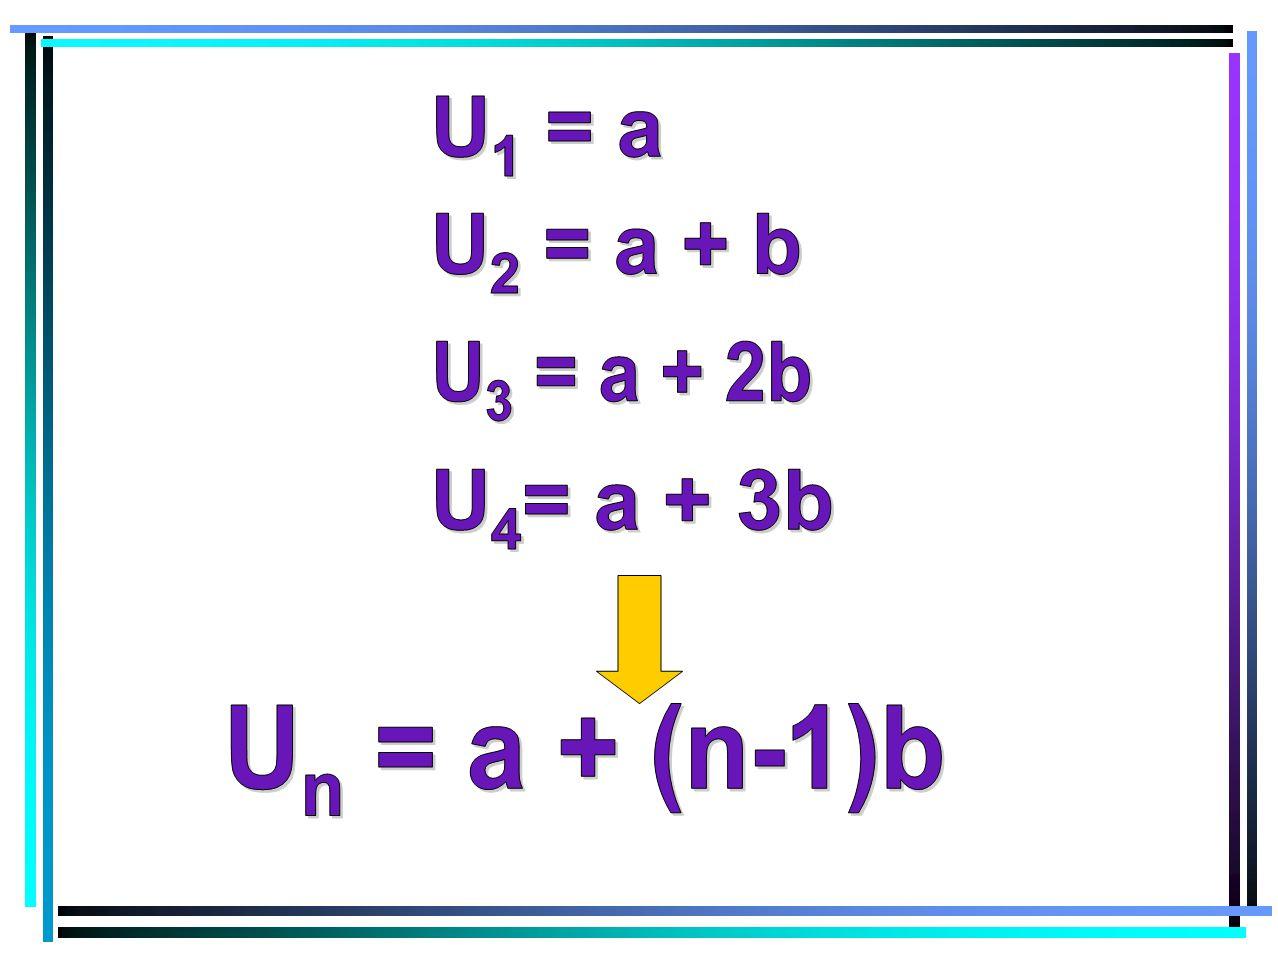 contoh Tentukan suku ke- 21 jika diketahui suku ke-5 dan suku ke-9 barisan aritmatika adalah 35 dan 43 .